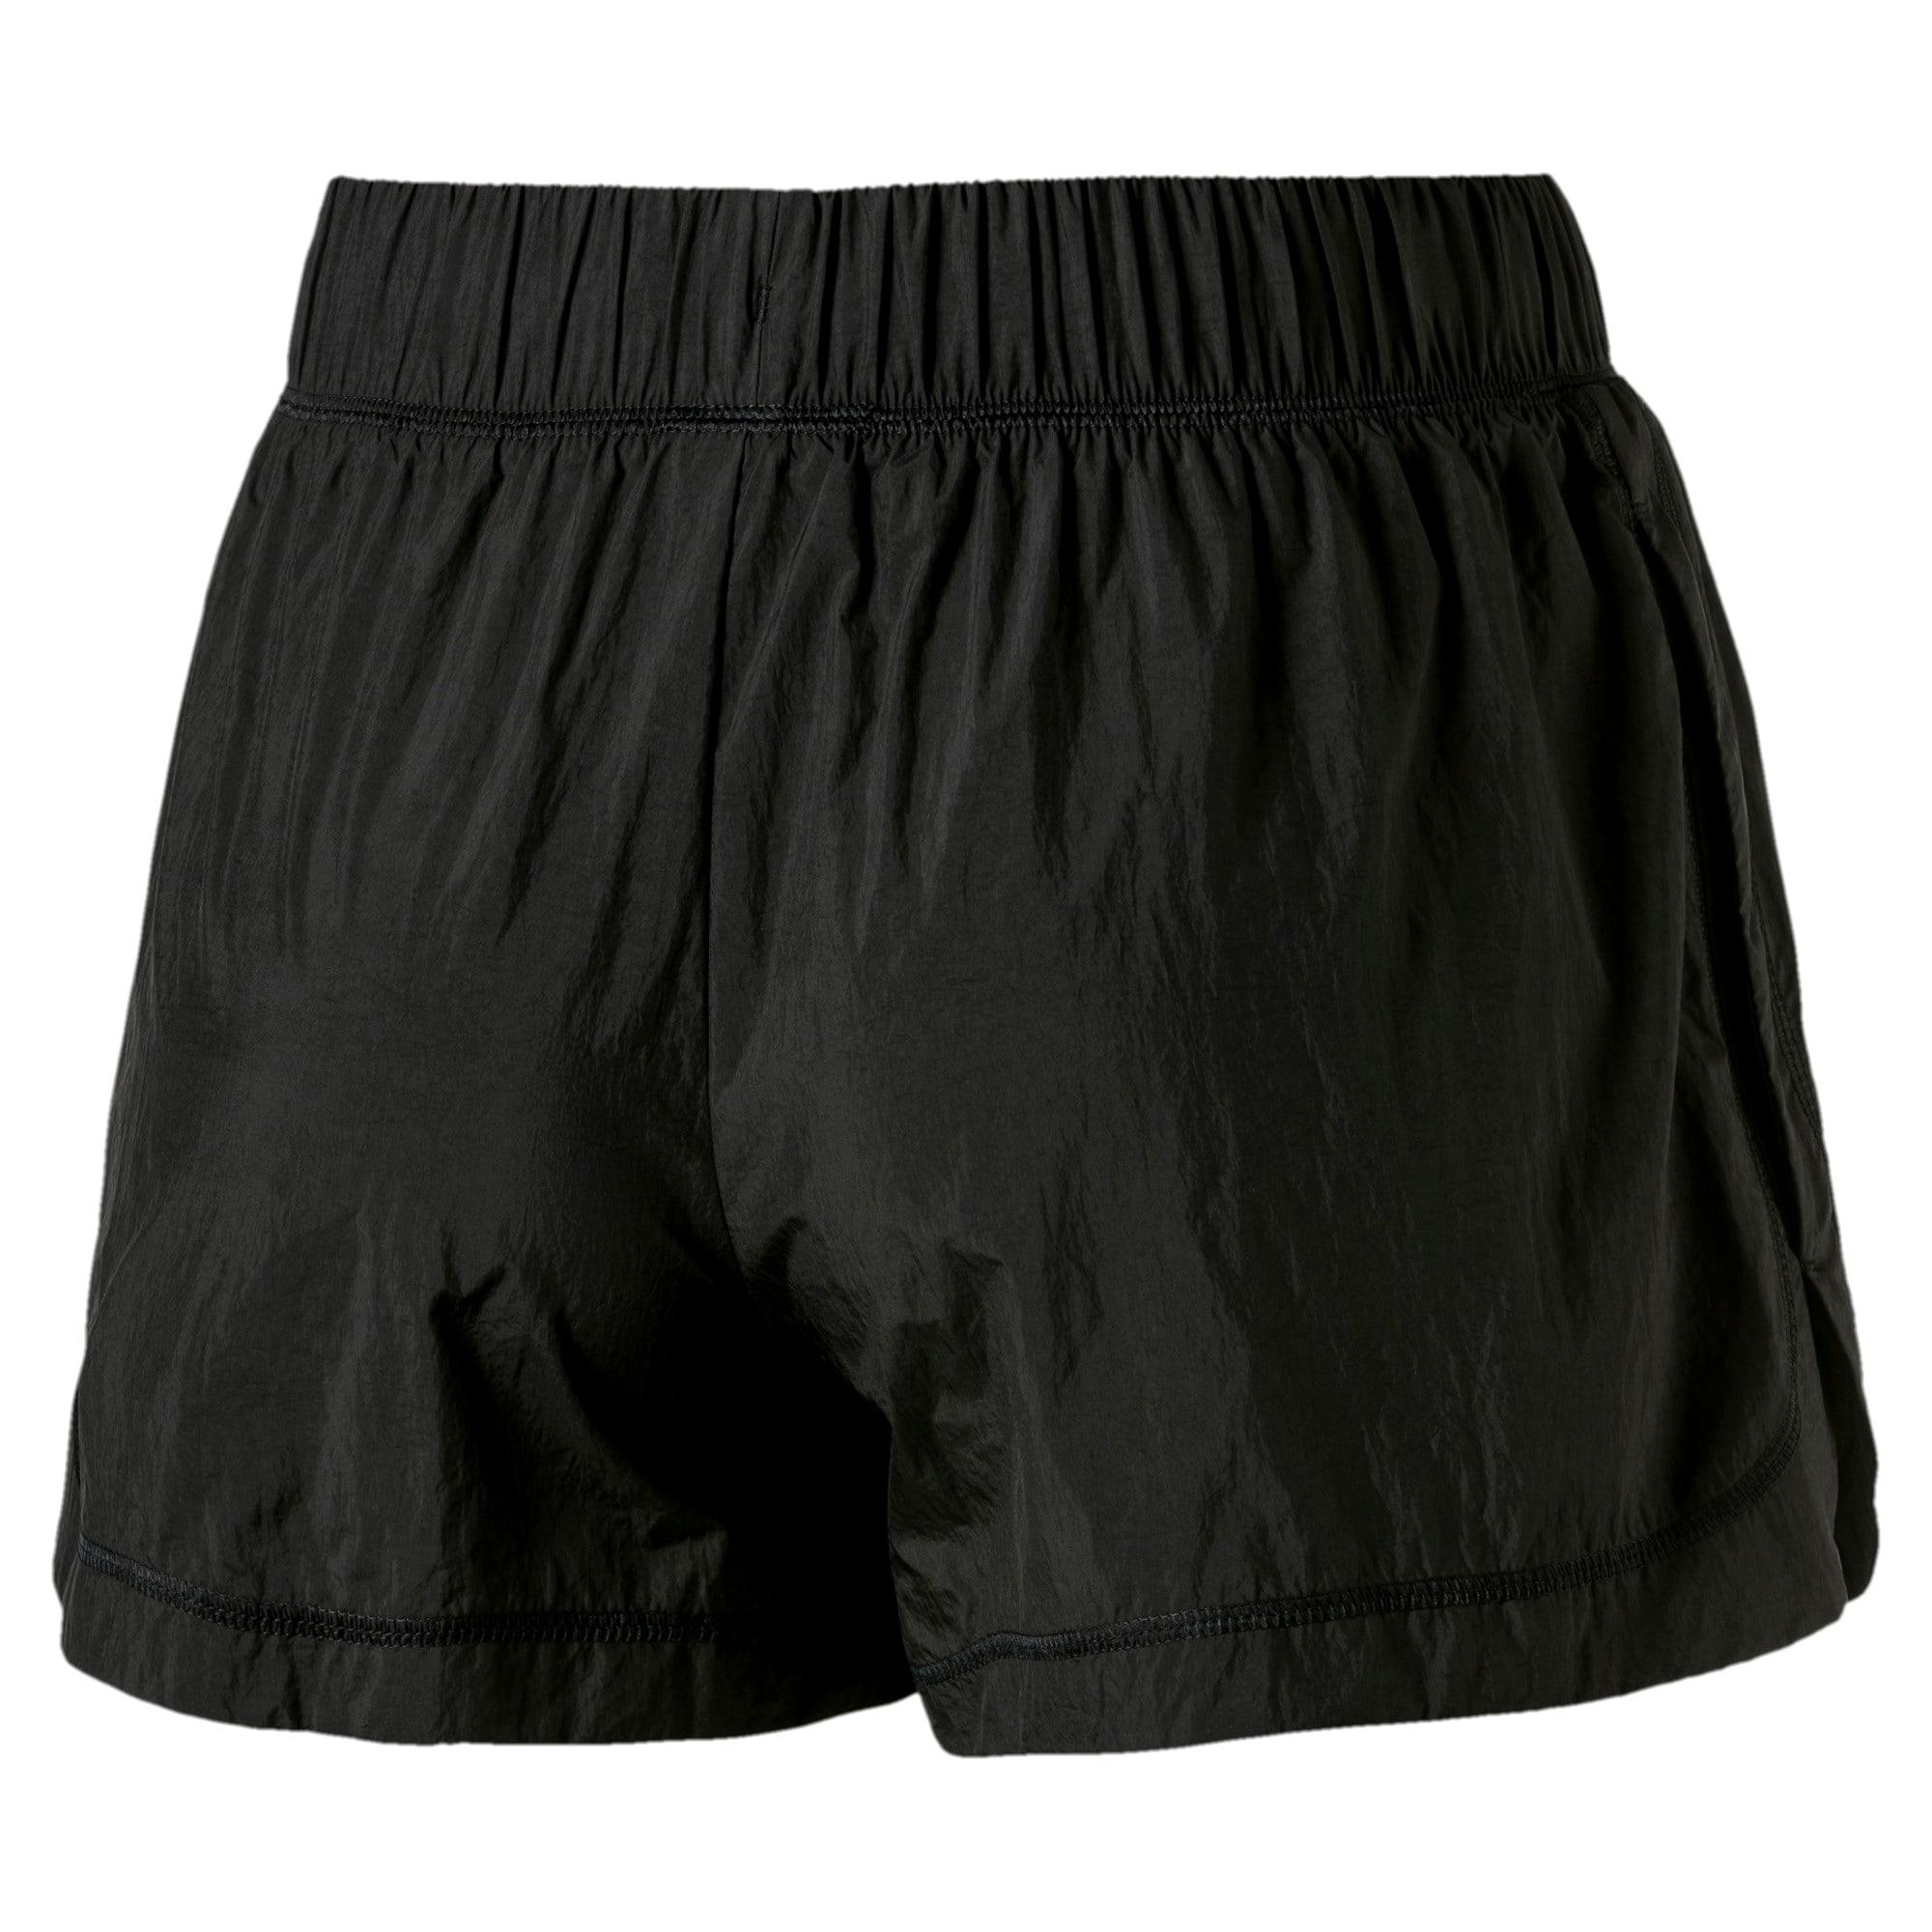 Thumbnail 2 of Bold Woven Women's Training Shorts, Puma Black, medium-SEA